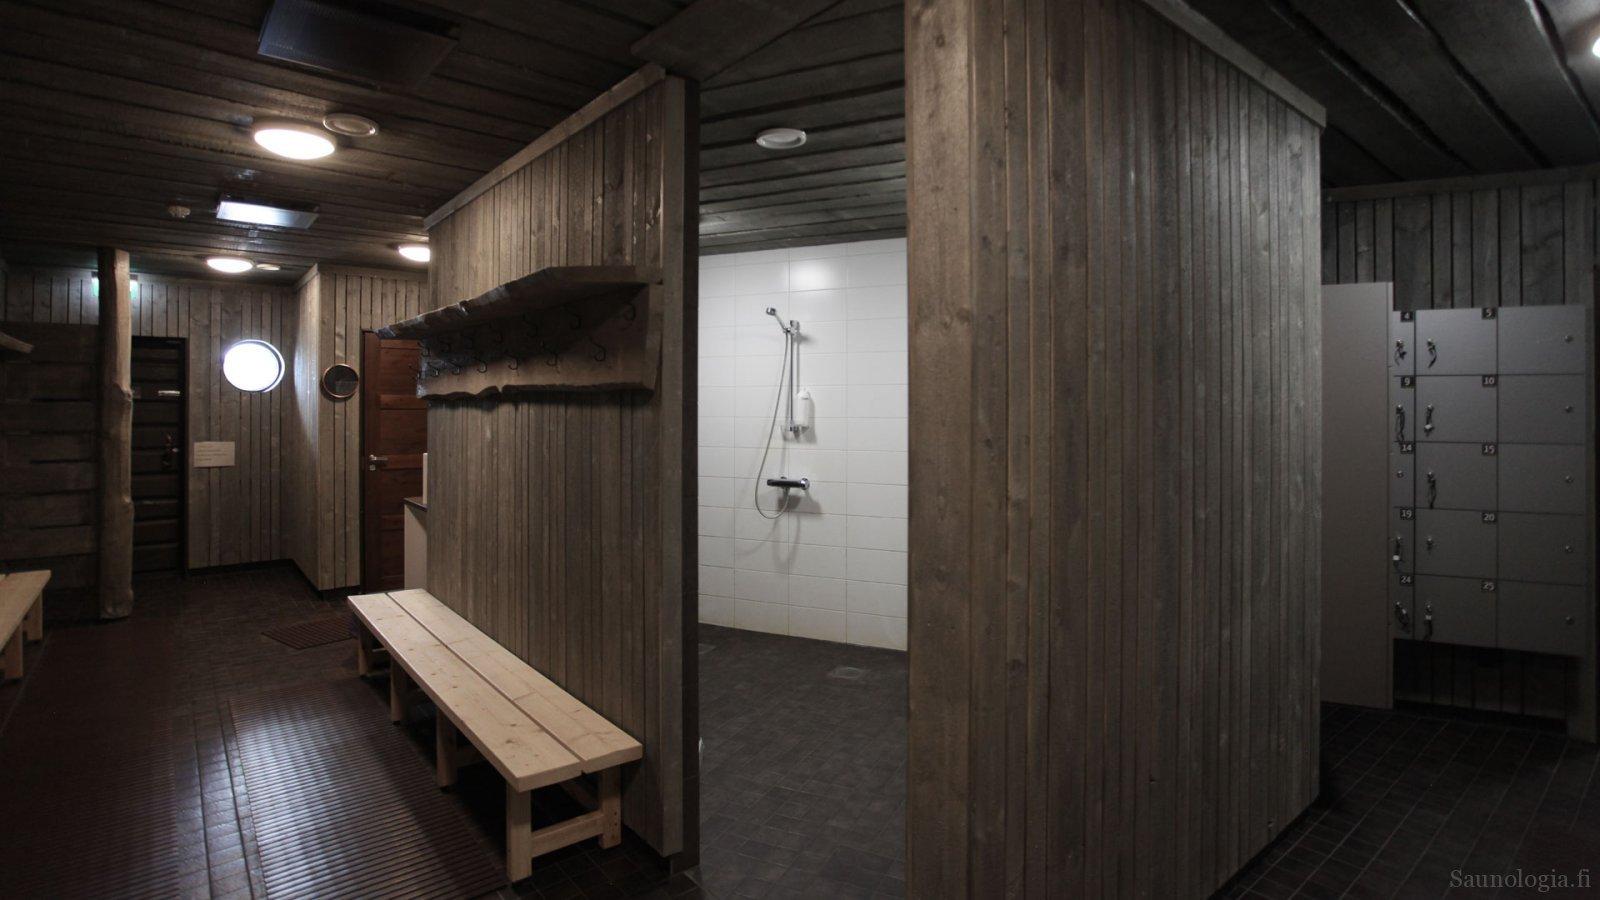 170831-tykkimaen-sauna-pukuhuonesuihkut-1600x900-2.jpg